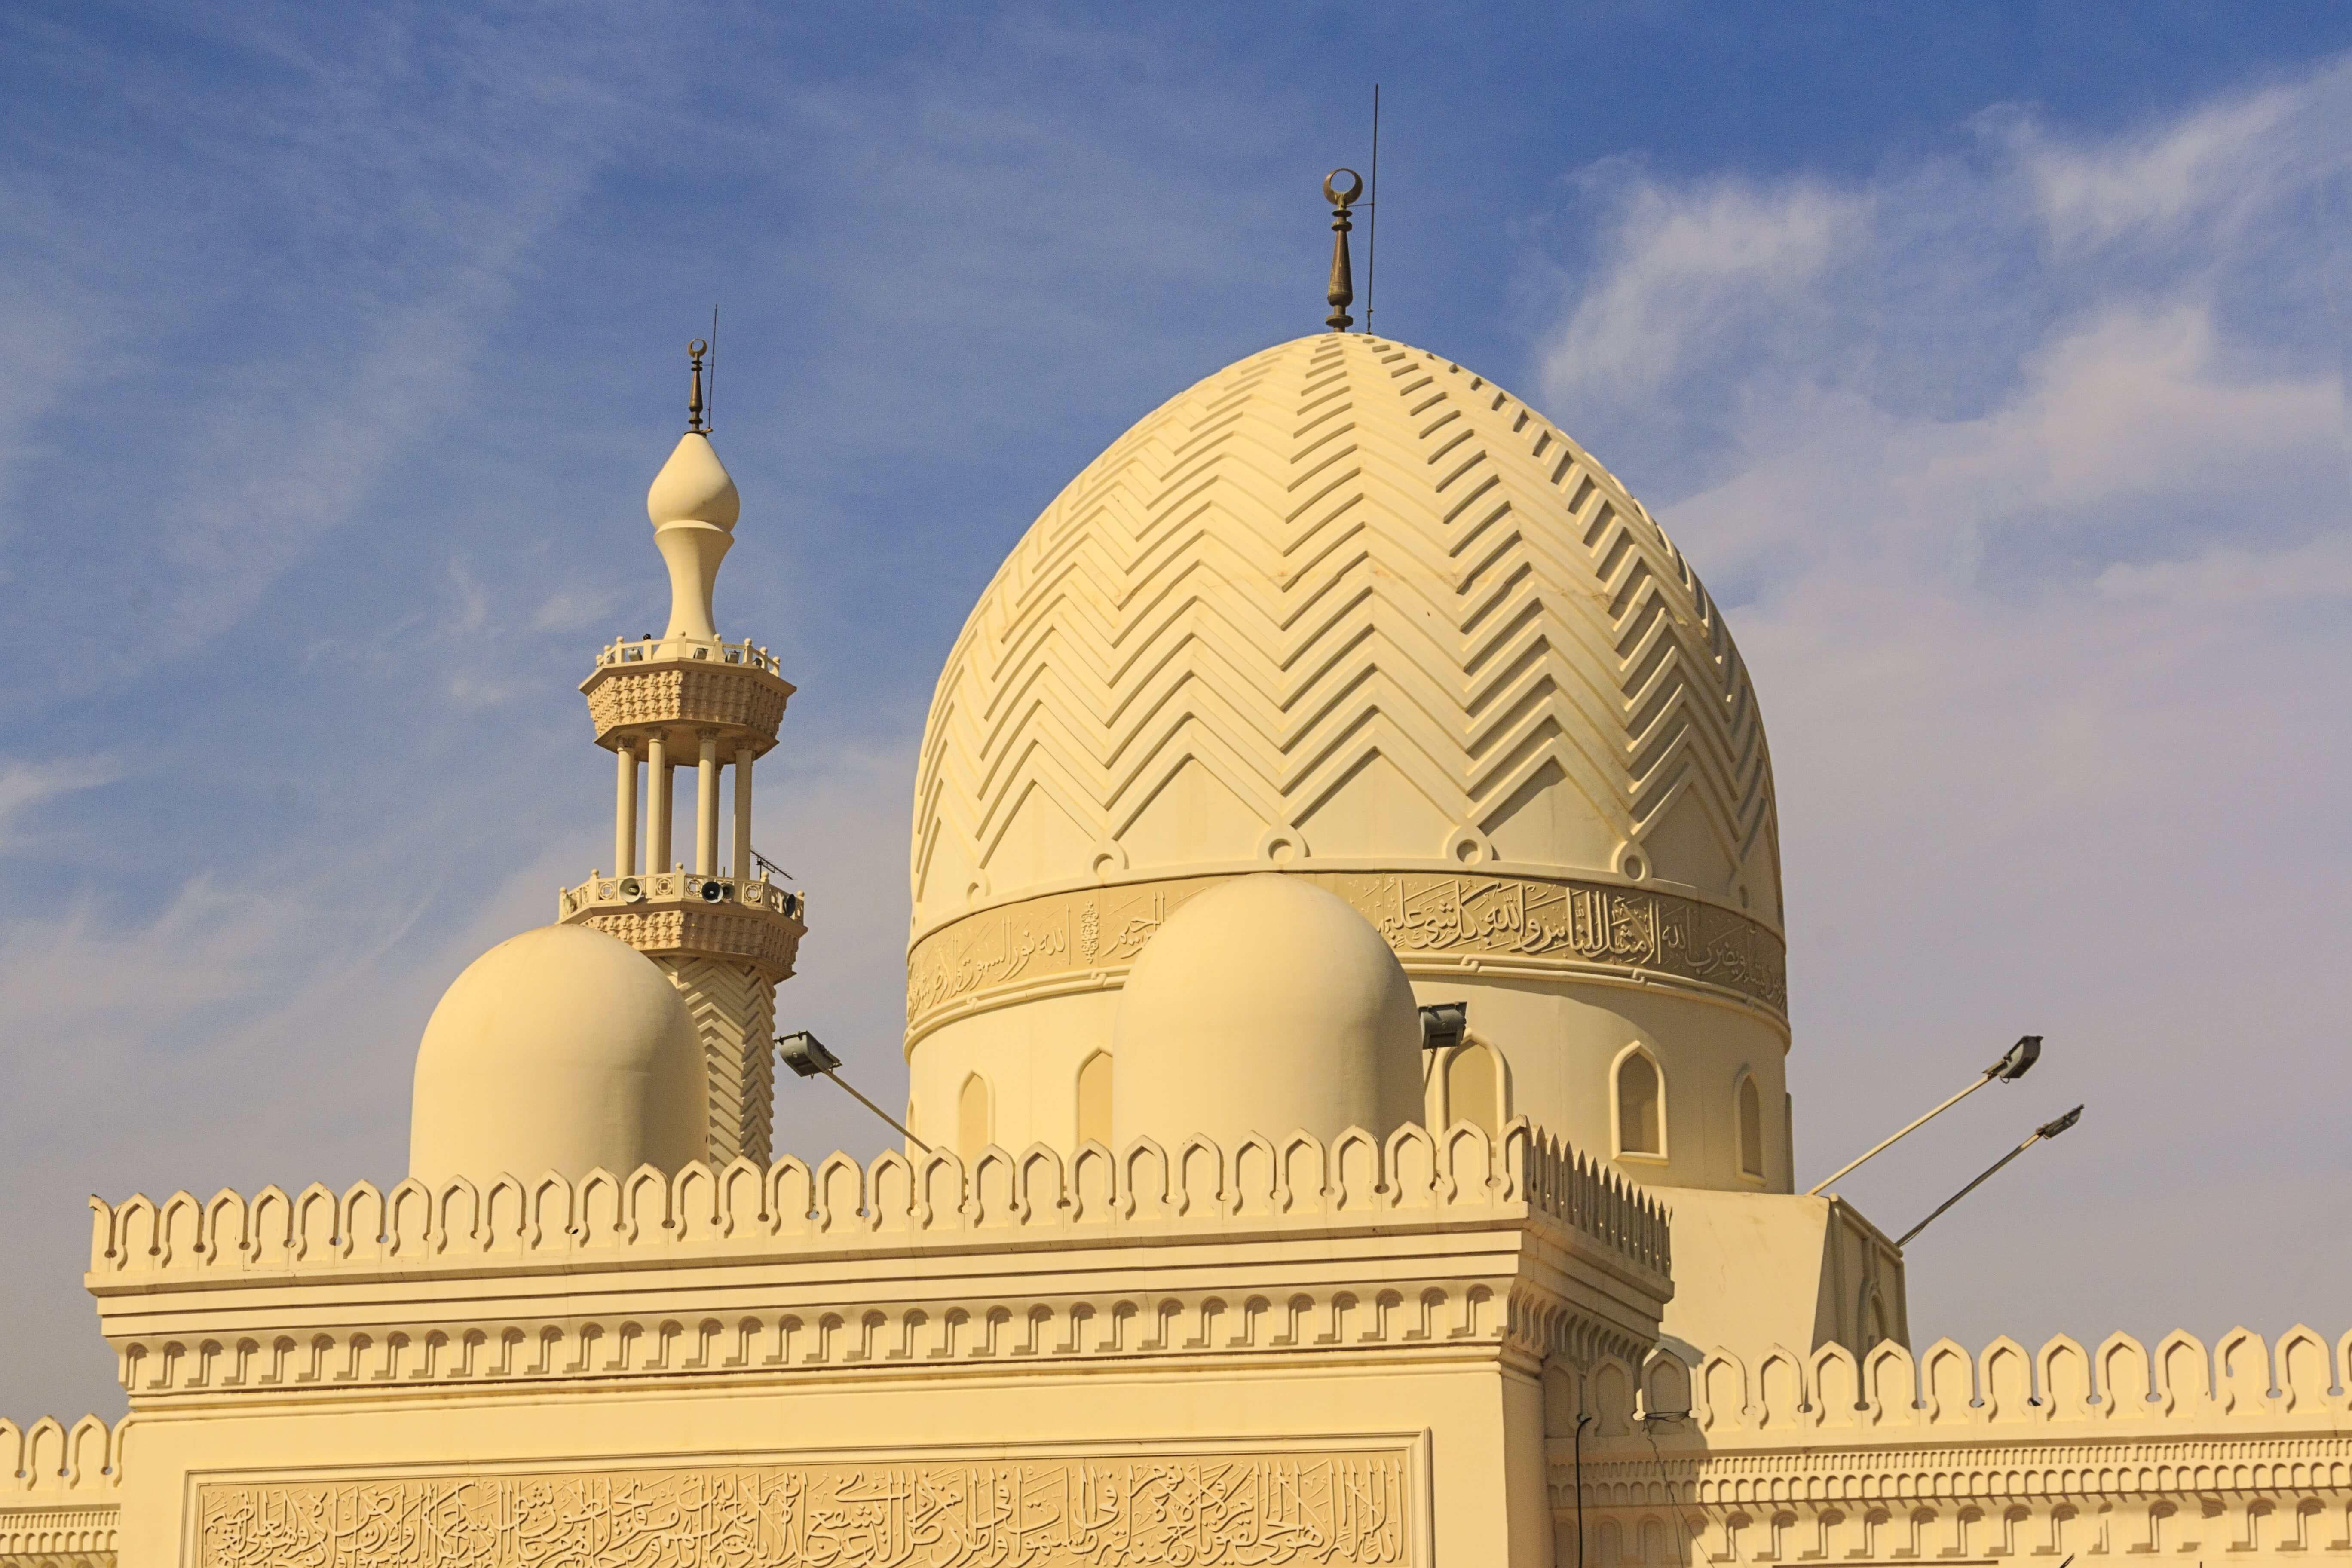 The Mosque of Aqaba